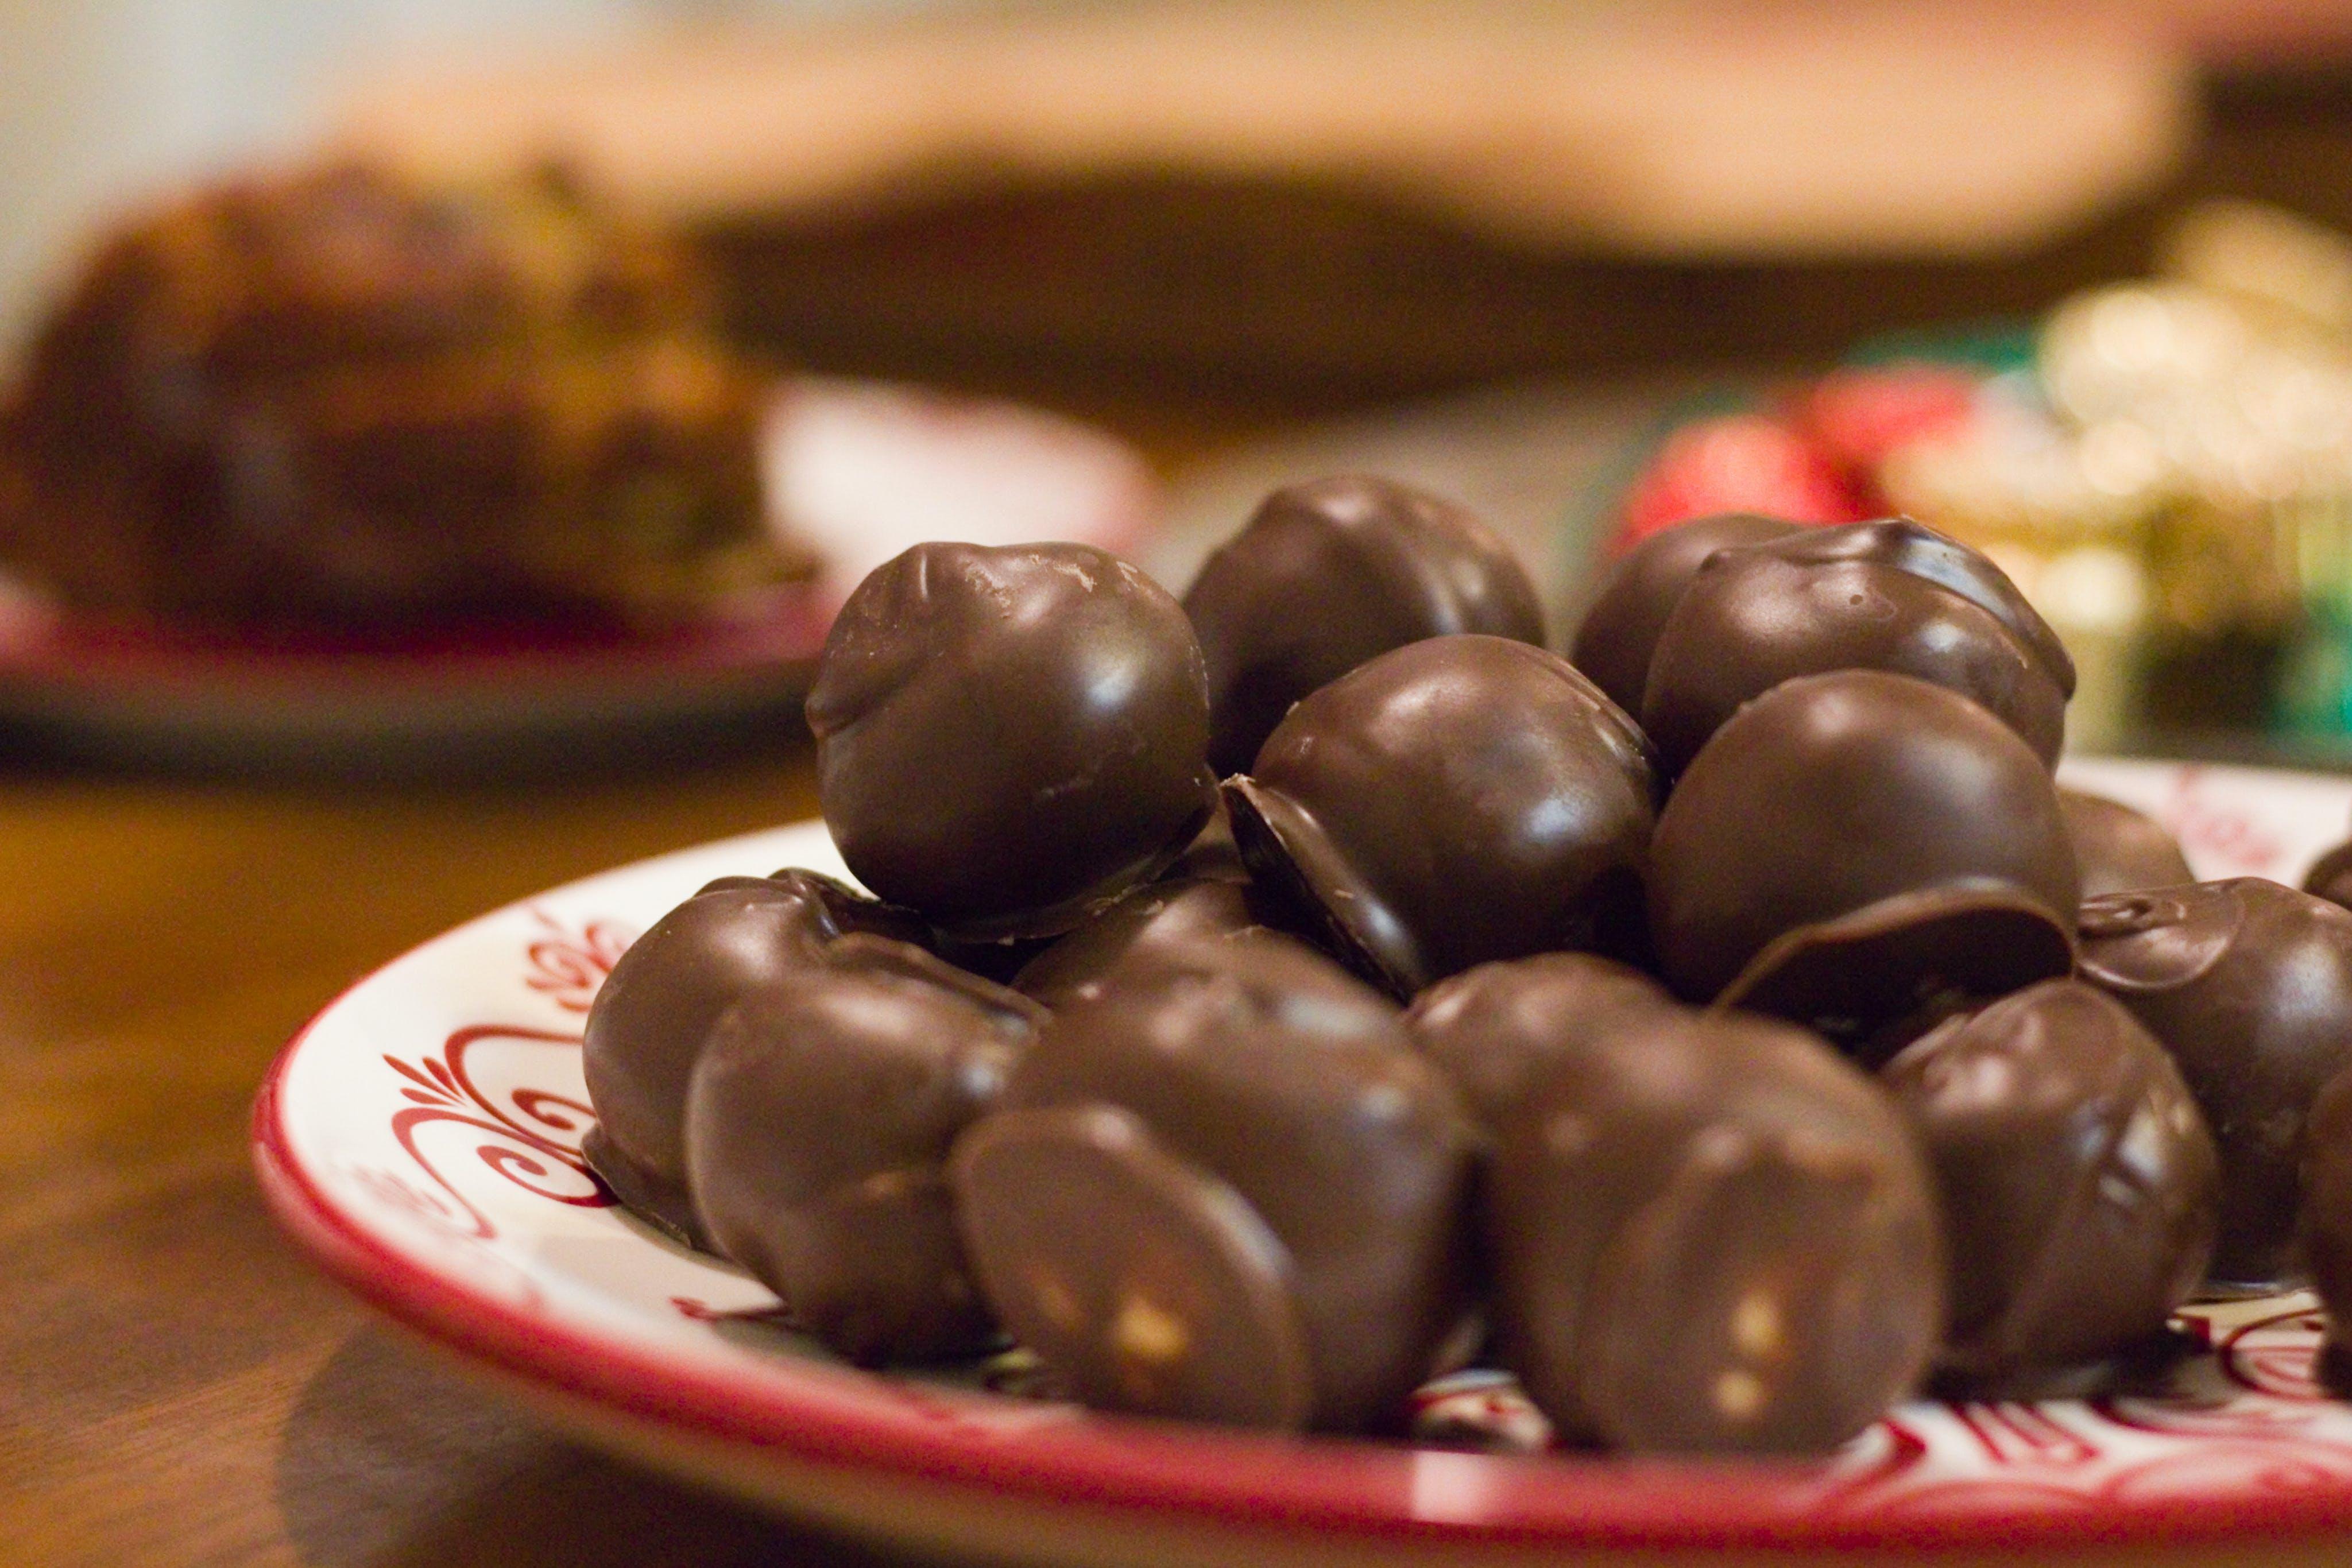 Free stock photo of calories, chocolate, decorative, delicious